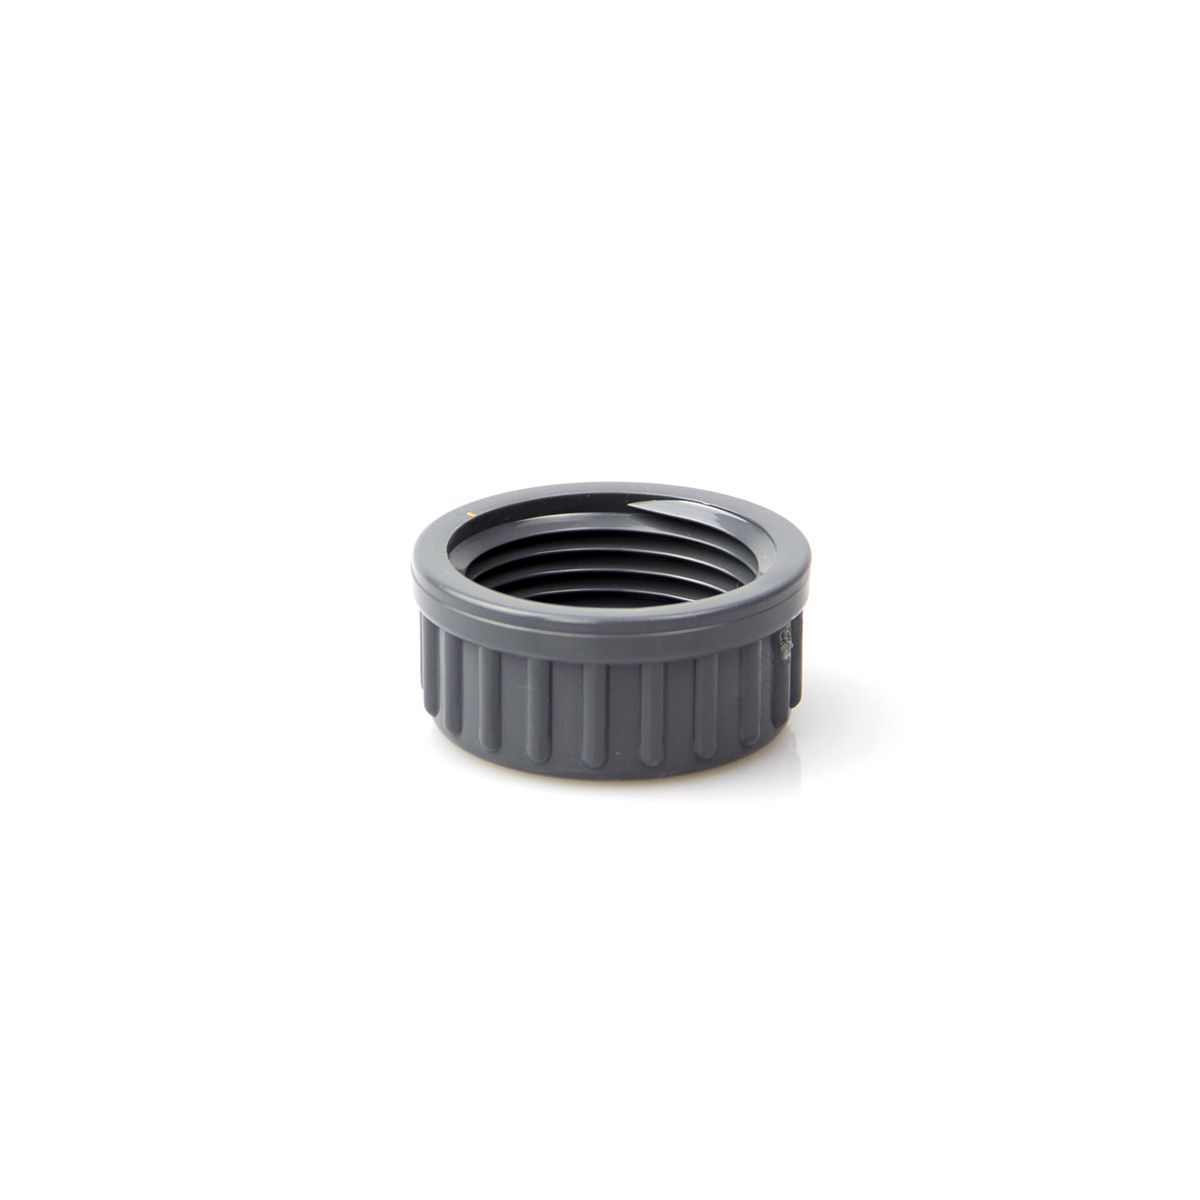 Endkappe mit Gewinde, aus PVC, grau, 3/8' IG, PN 16